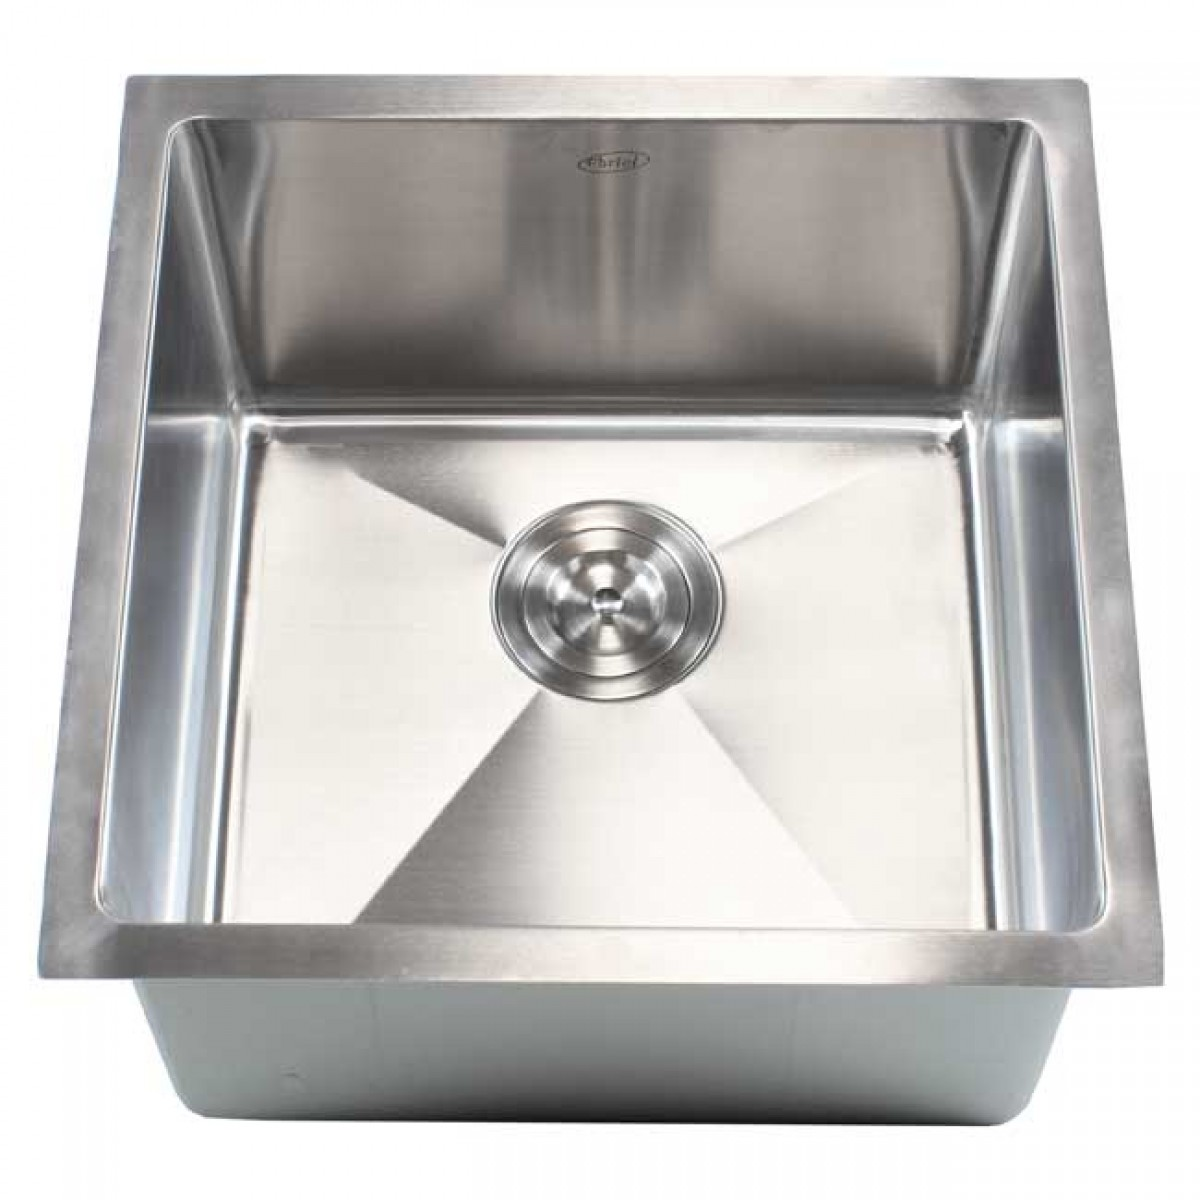 undermount single bowl kitchen sink lights for ceiling ariel 18 inch stainless steel bar prep 15mm radius design 16 gauge